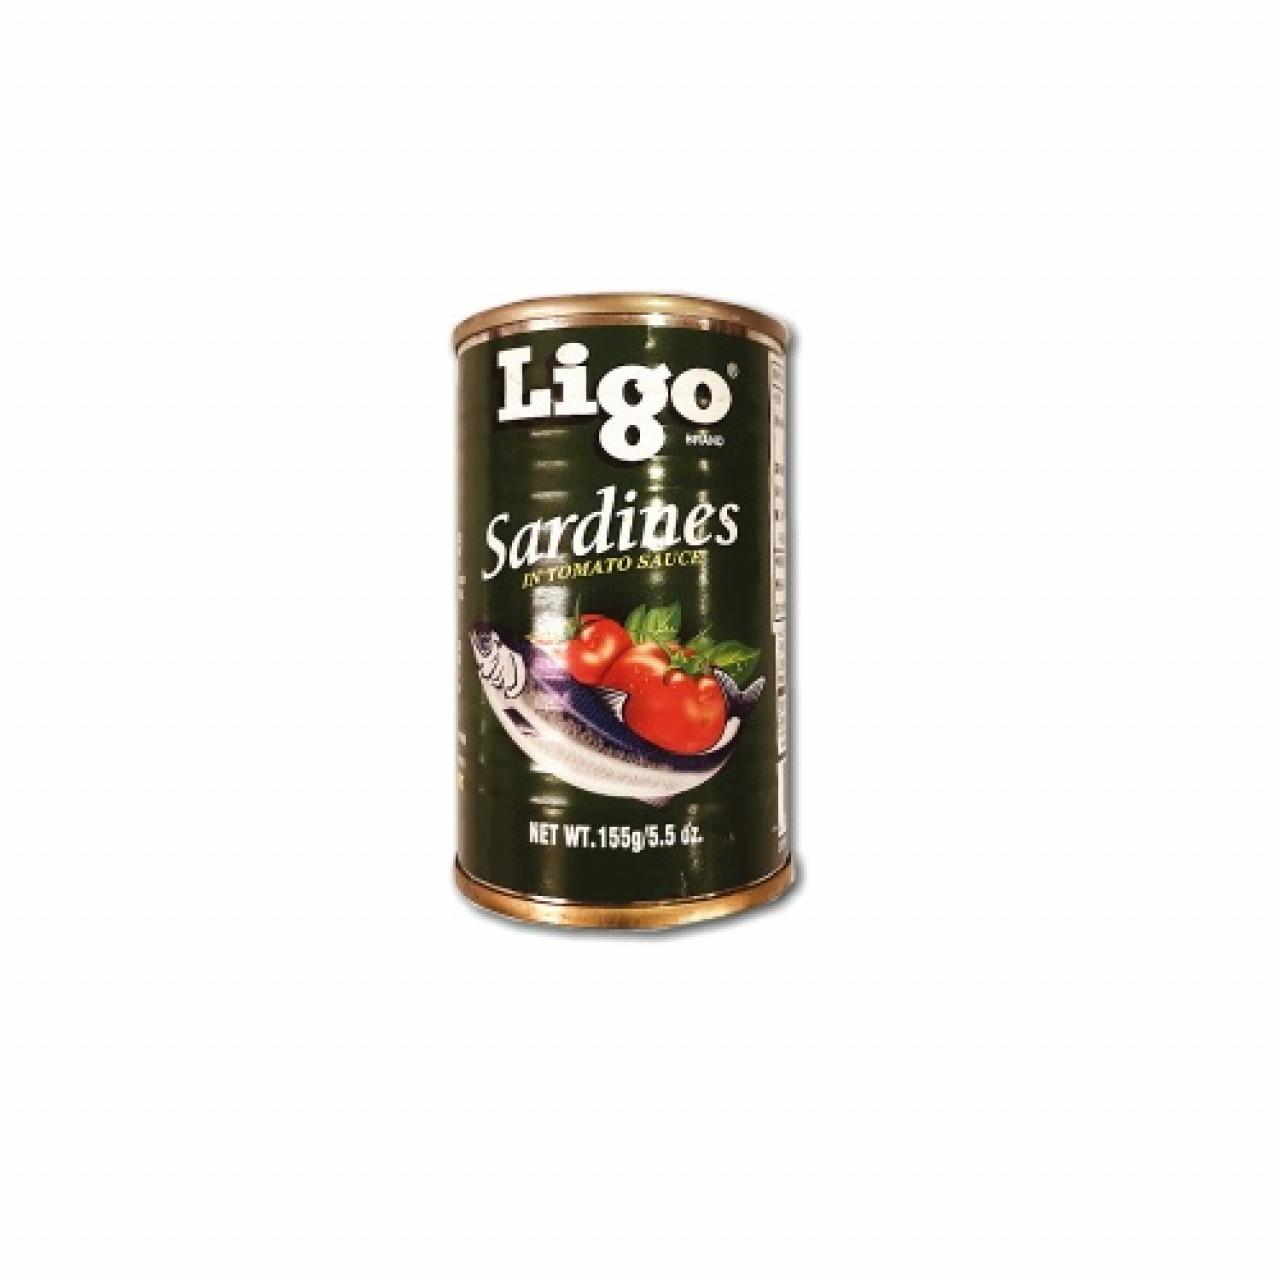 Ligo sardines in tomato sauce 155gm RHF